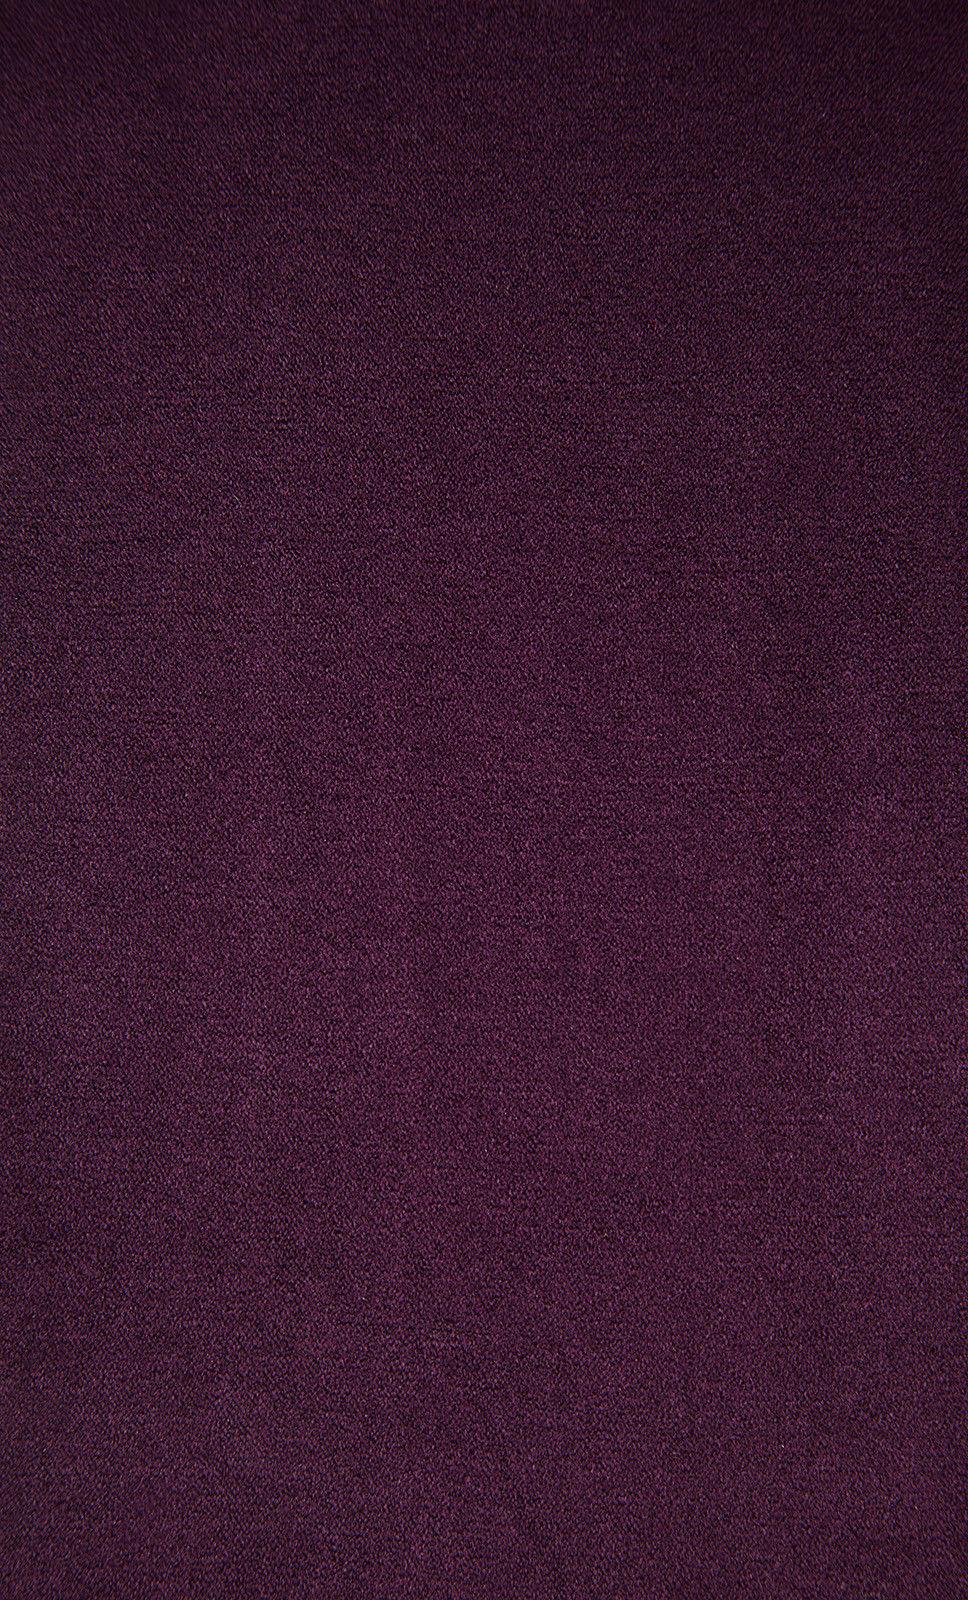 Solid-Shadow-Purple-